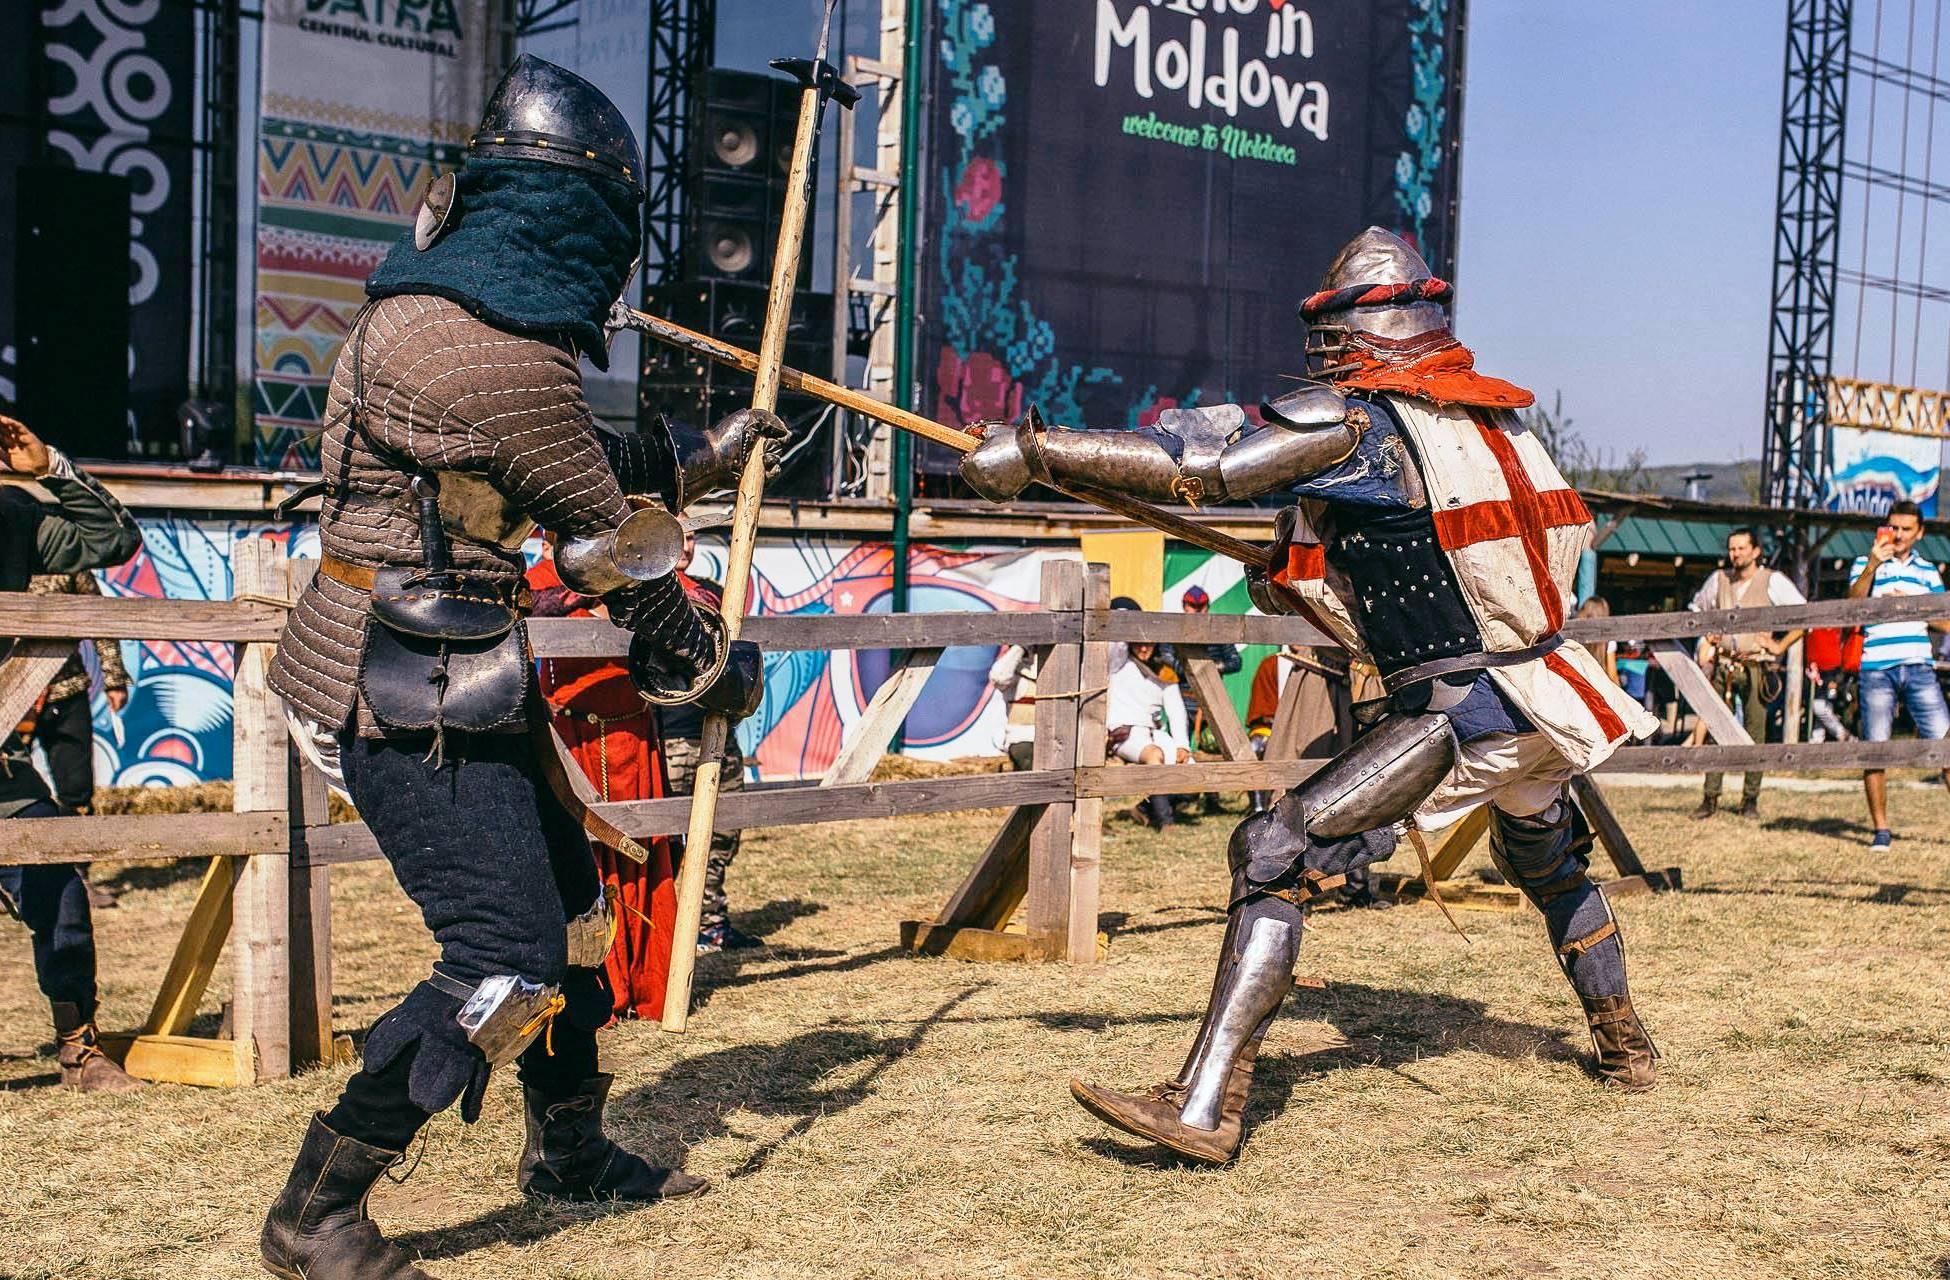 turnir 1 la 1 cavaleri festival medieval 2018 md vatra